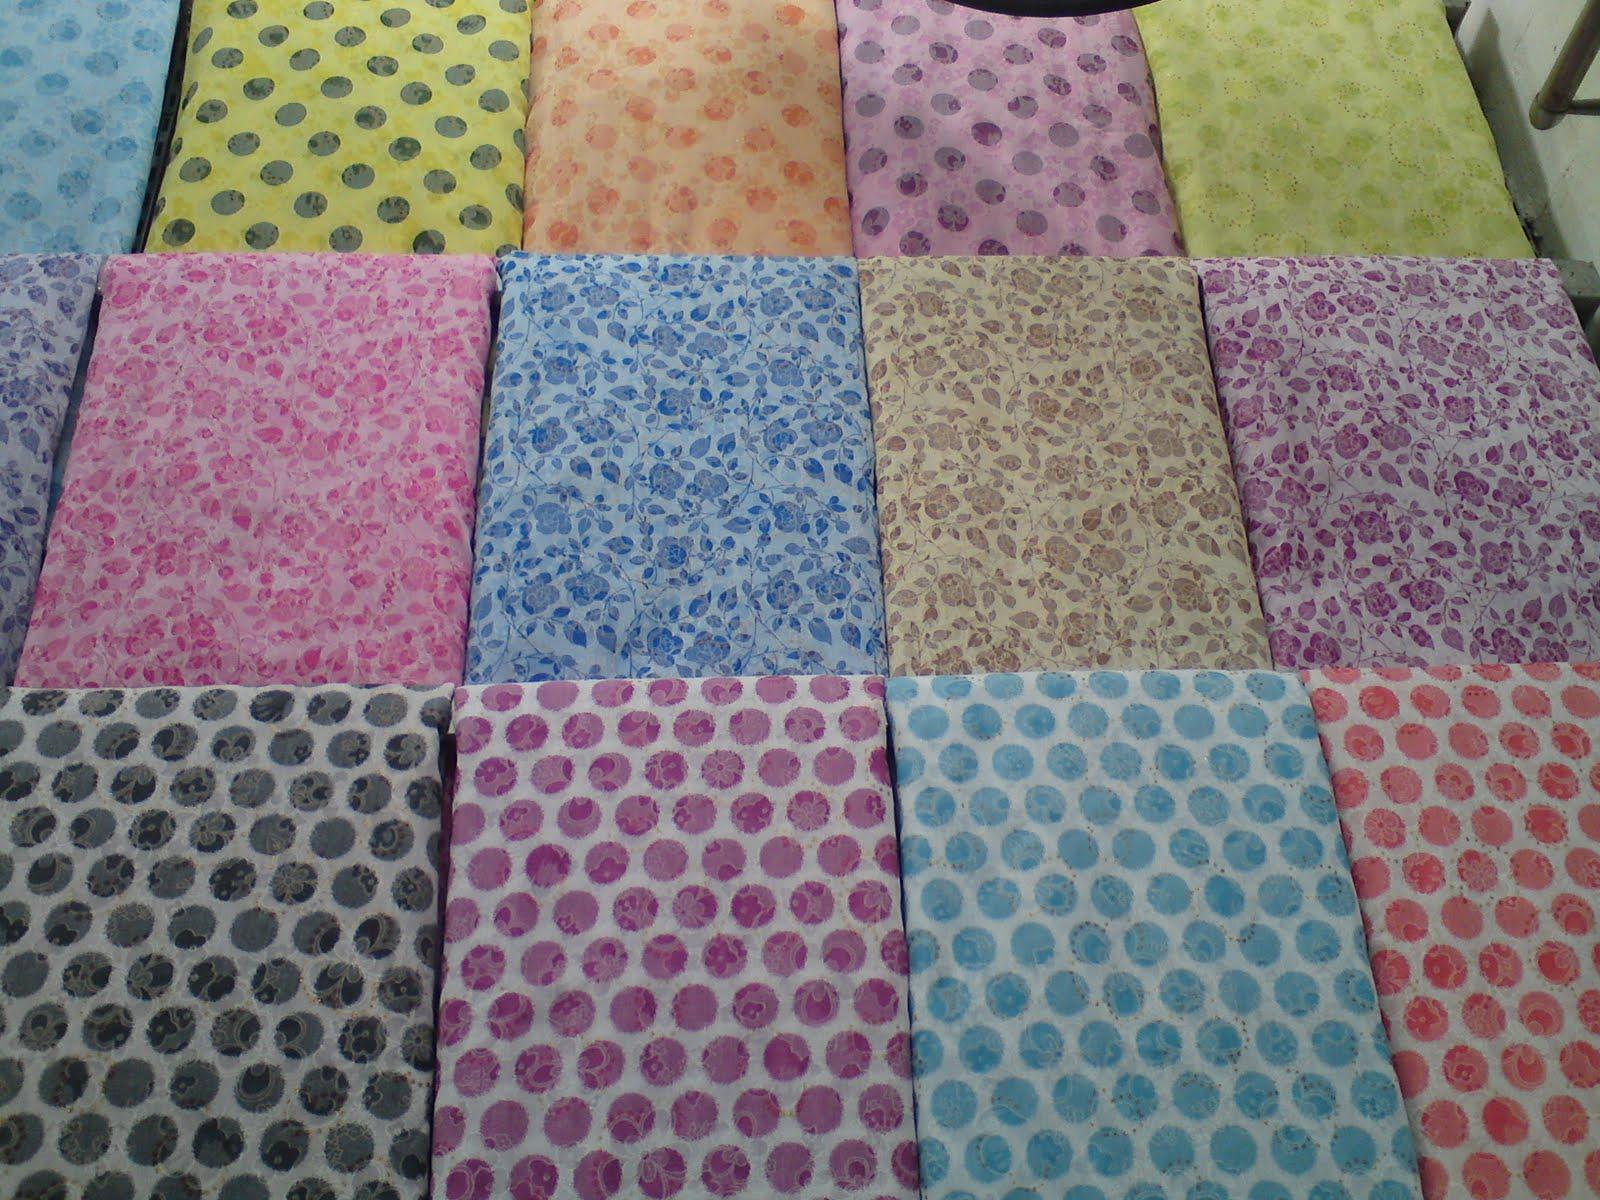 9914112 (layari facebook ceriashoppingmall): Kain cotton corak terkini